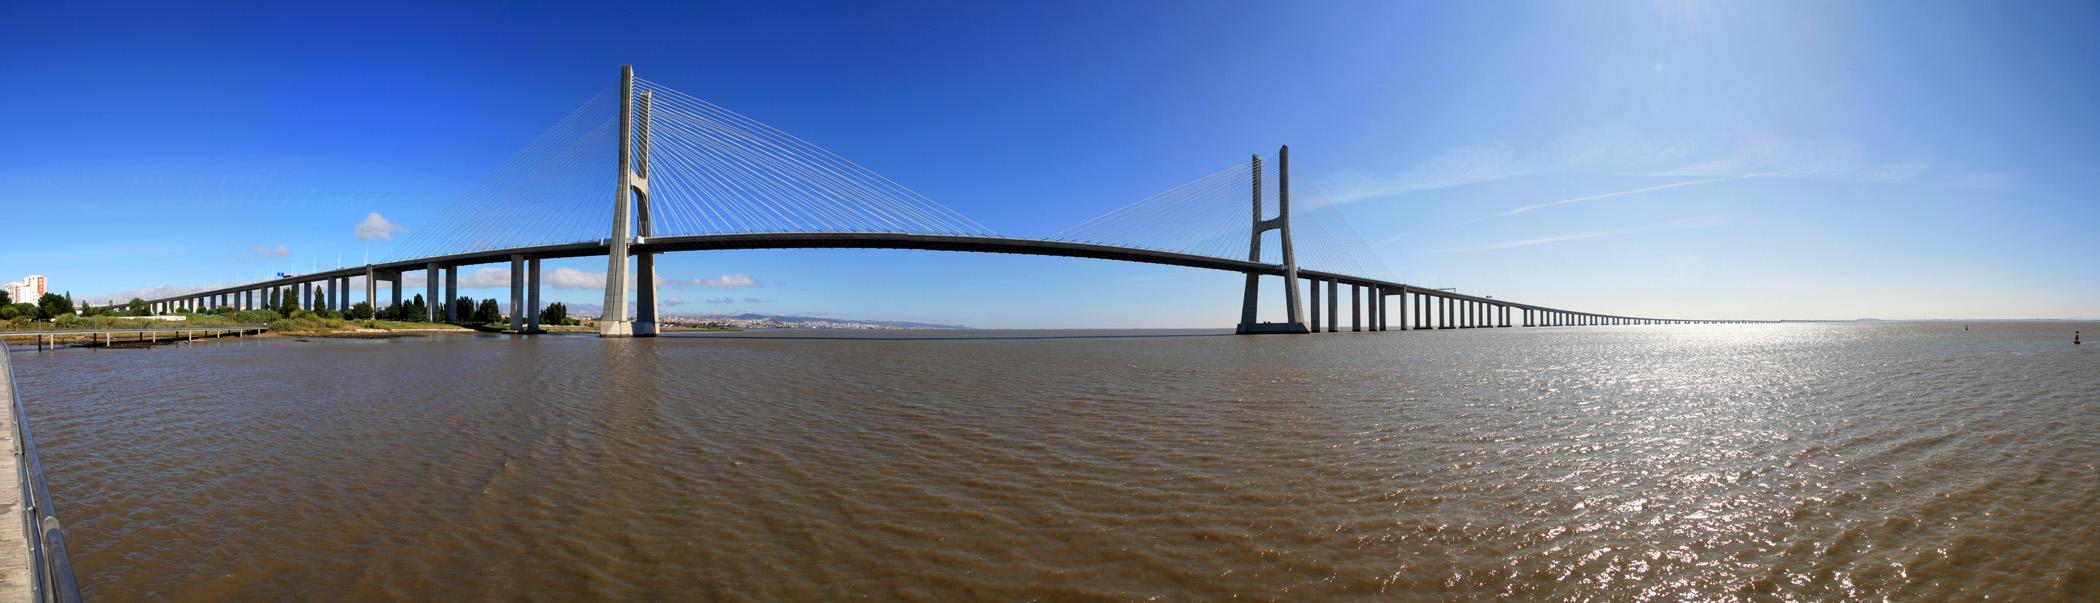 Panoràmica del Pont Vasco da Gama